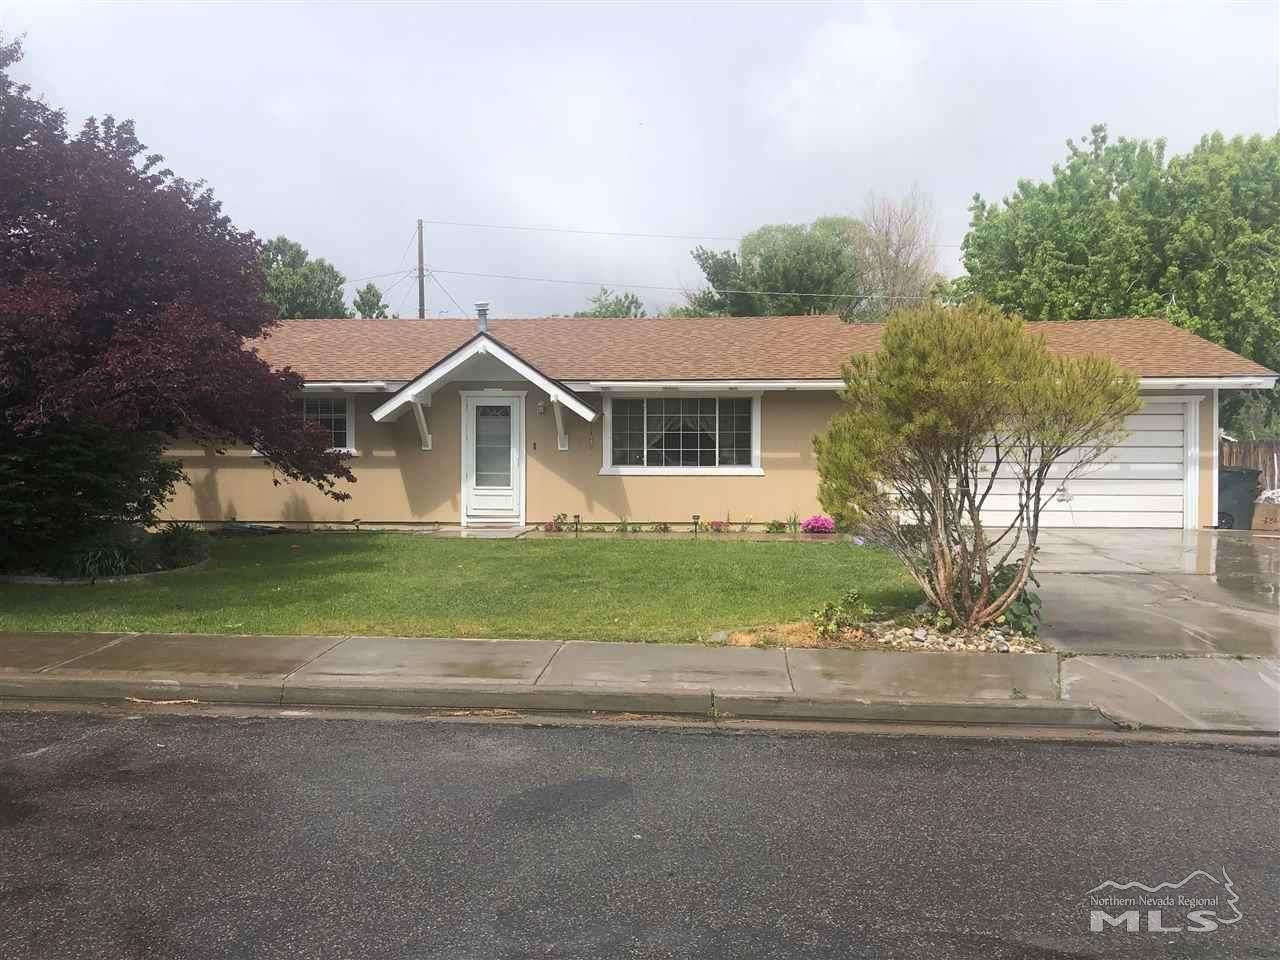 203 S Oregon - Photo 1